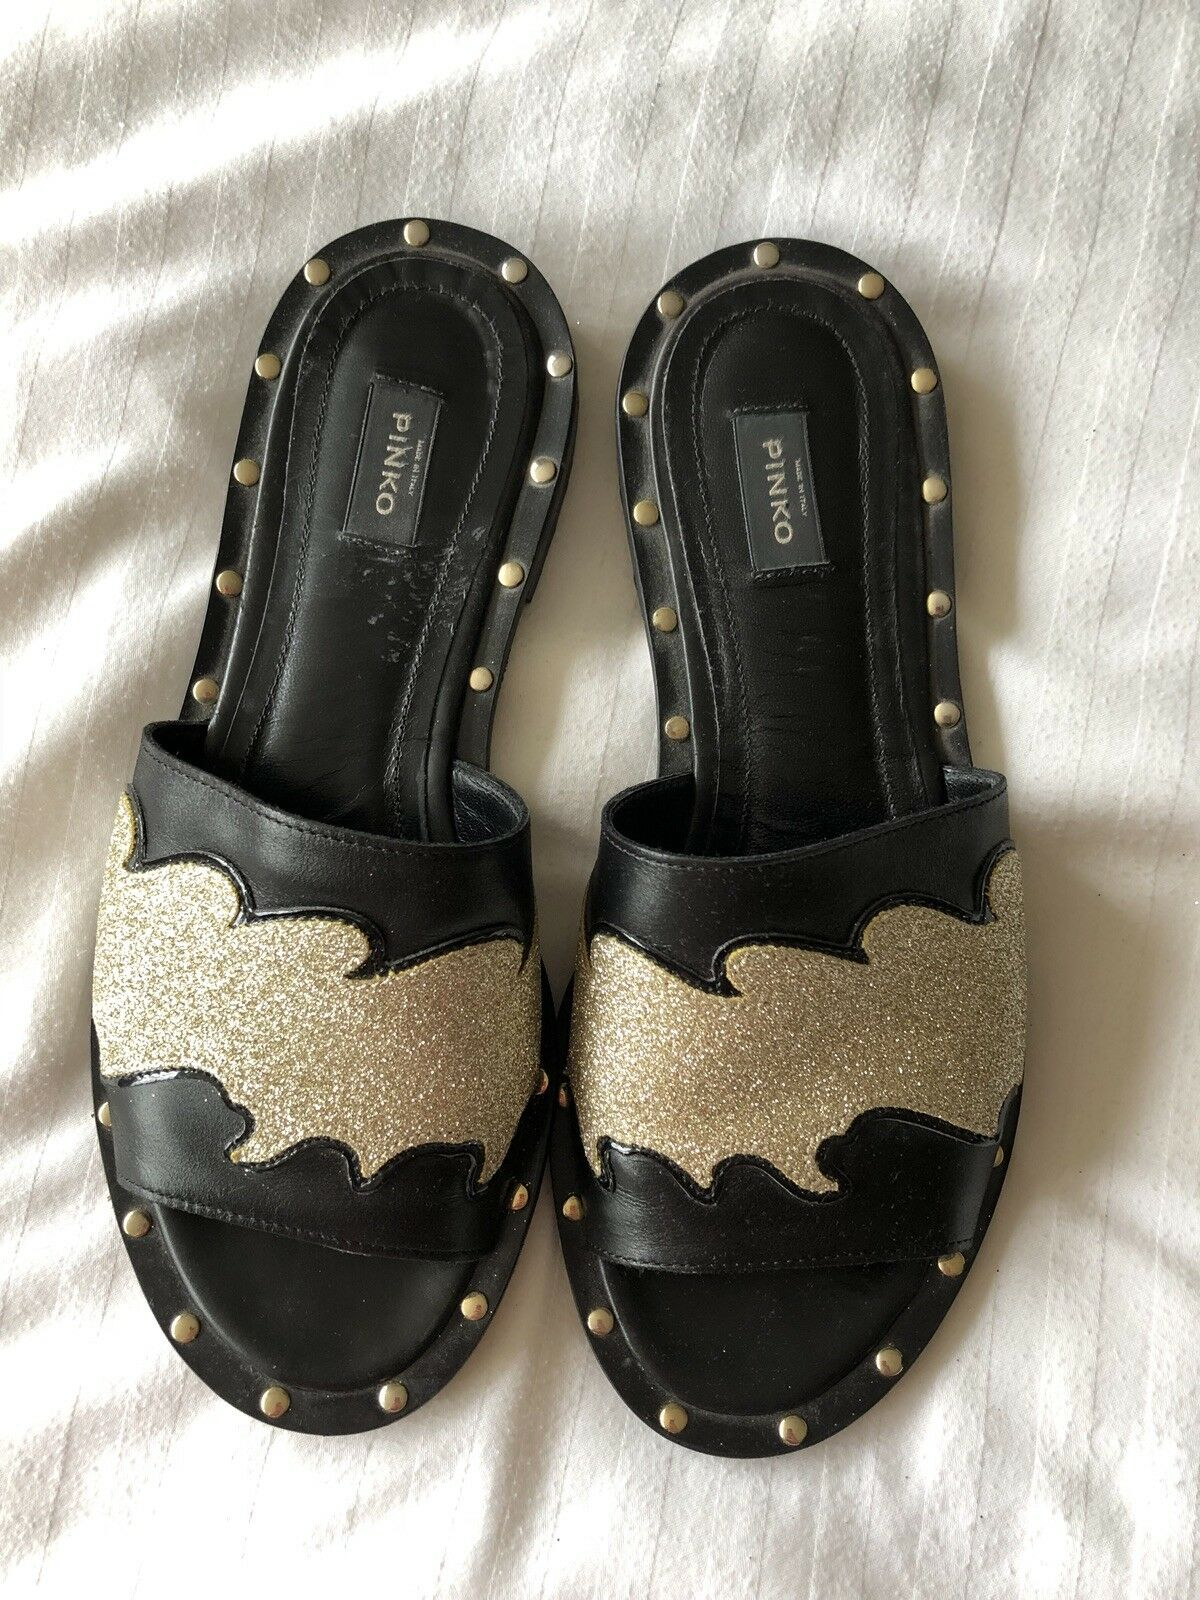 Pinko Nebbiolo Slider Sandals Black And gold Glitter Size 37